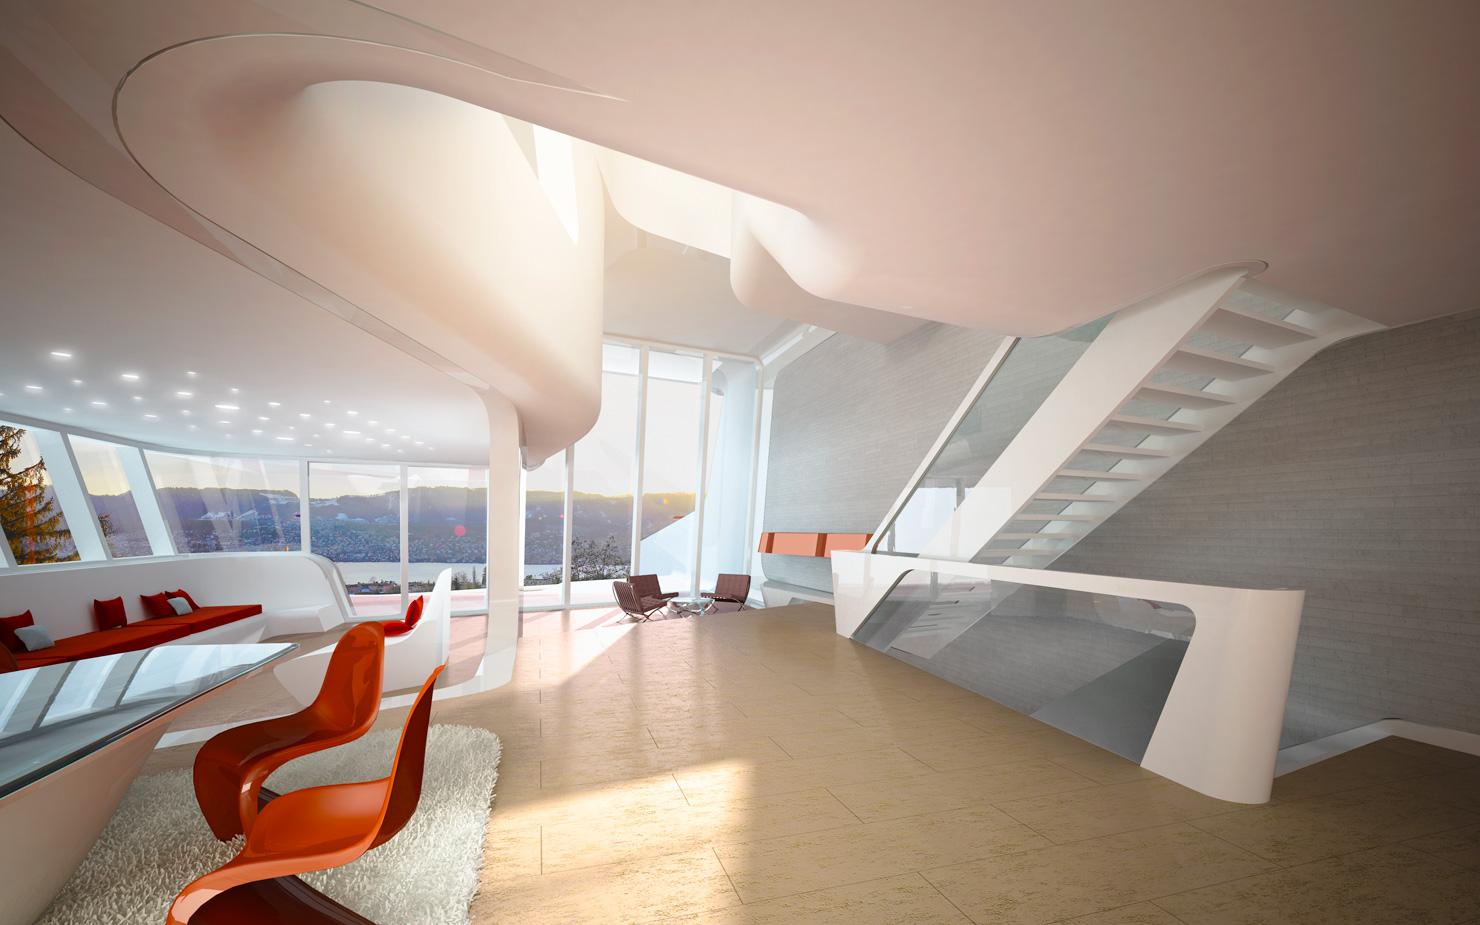 vectorvision bauen digital villa in k snacht ch. Black Bedroom Furniture Sets. Home Design Ideas